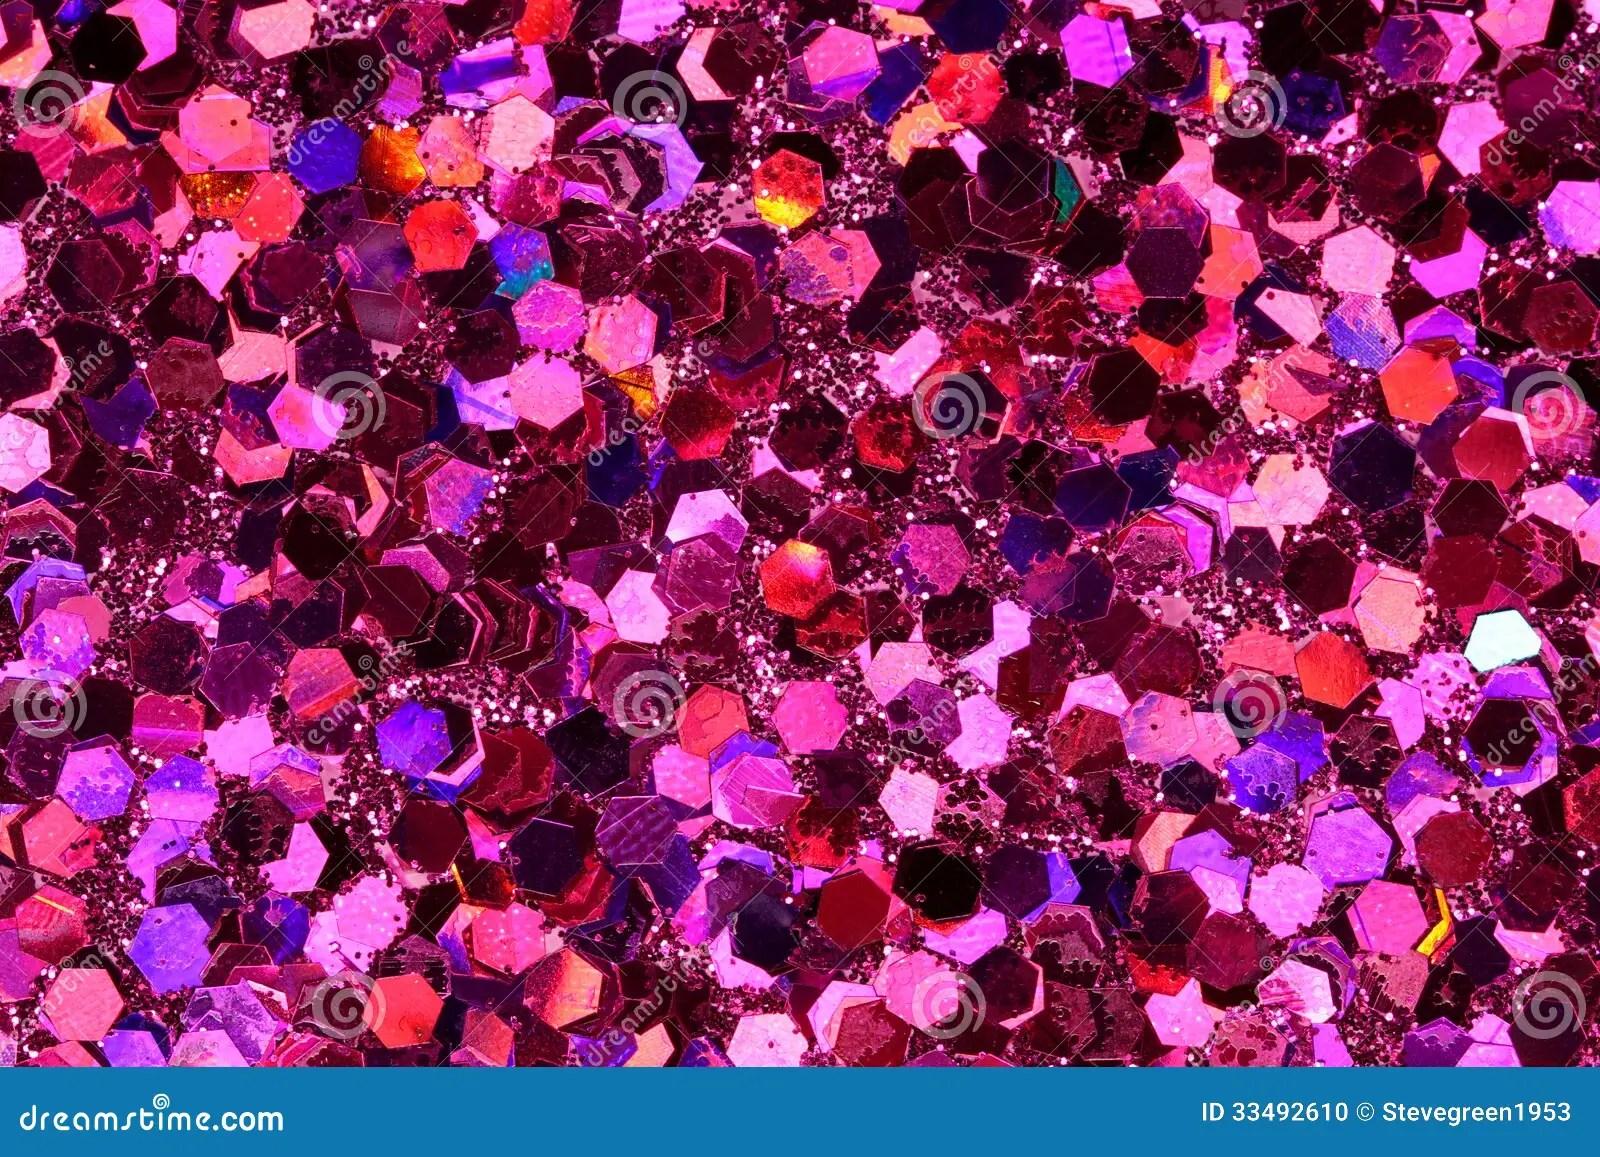 Cute Llamacorn Wallpaper Red Pink Purple Glitter Background Stock Photo Image